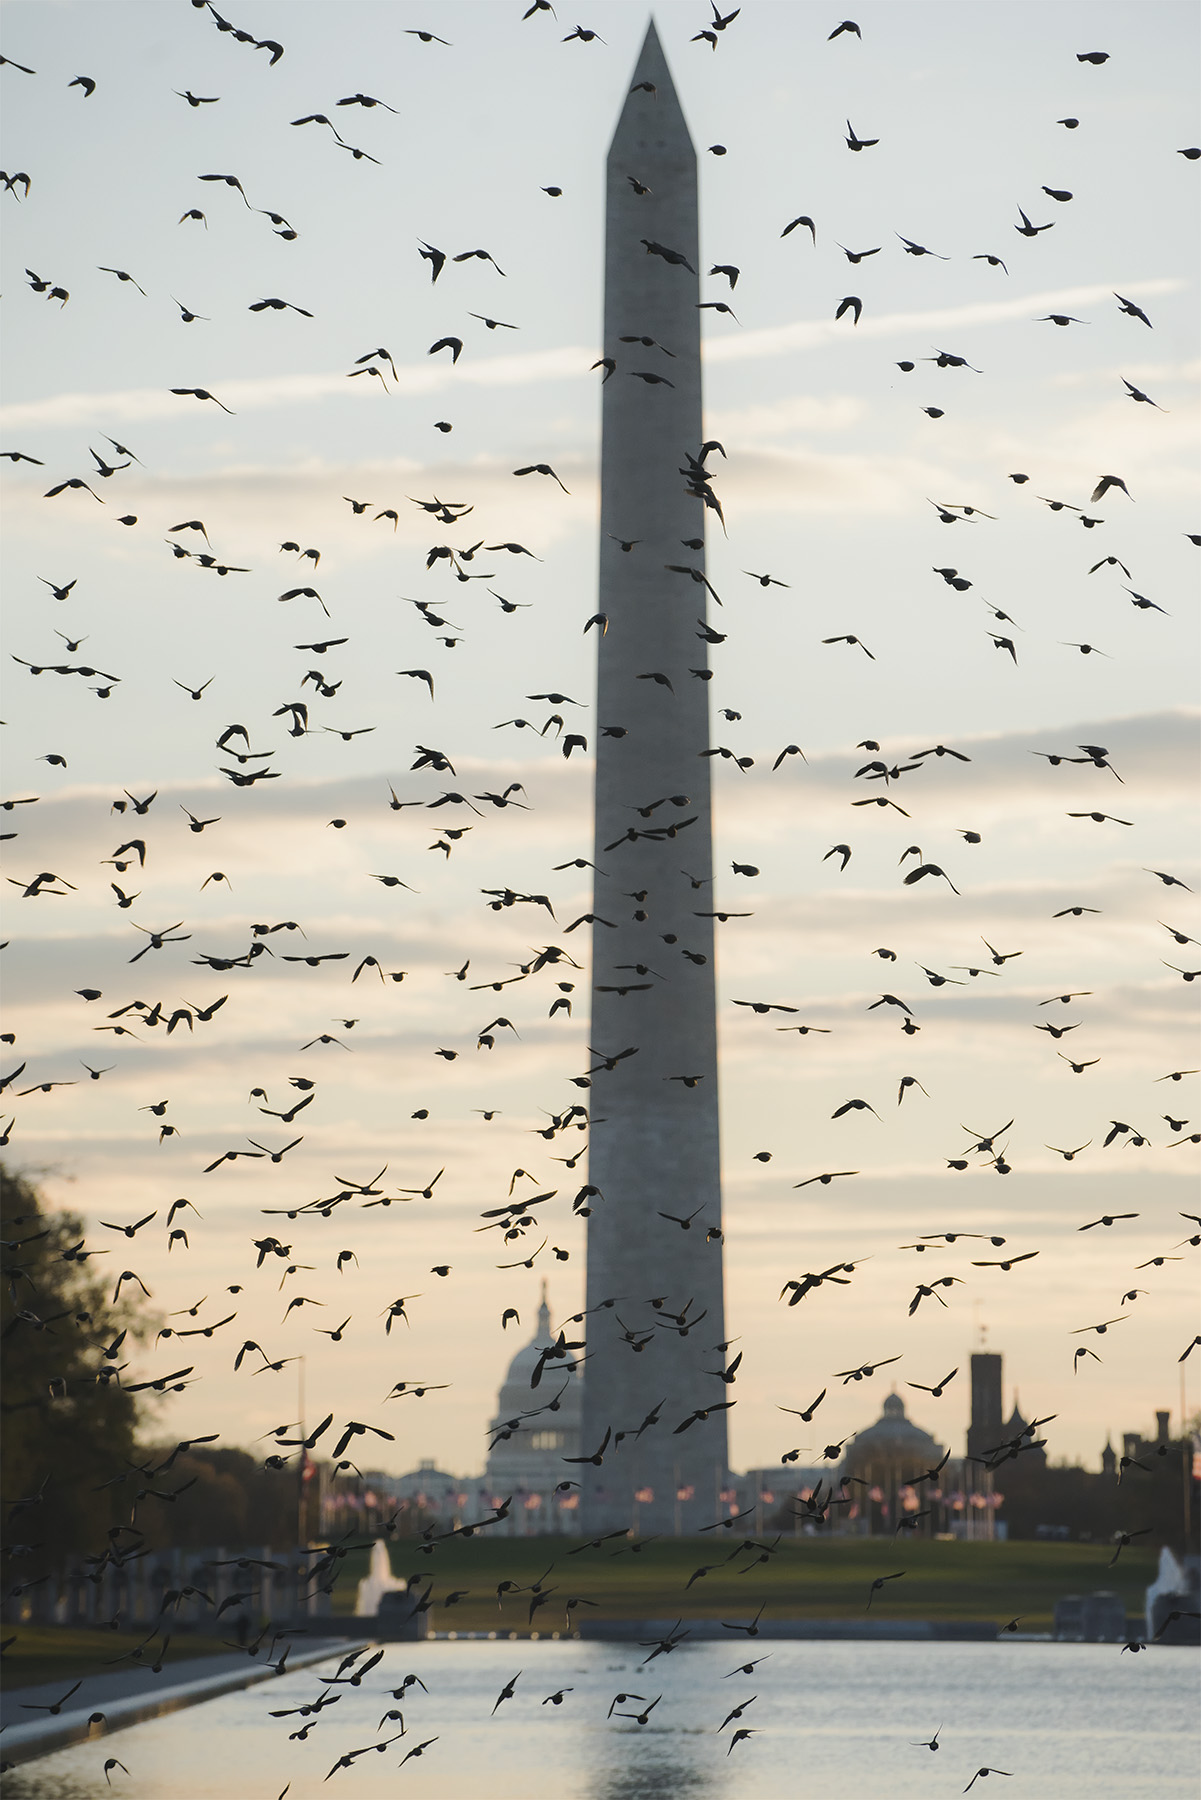 Birds of DC, national mall, washington dc, reflecting pool, lincoln memorial, black birds, washington monument, us capitol, early morning, sunrise, images, photos